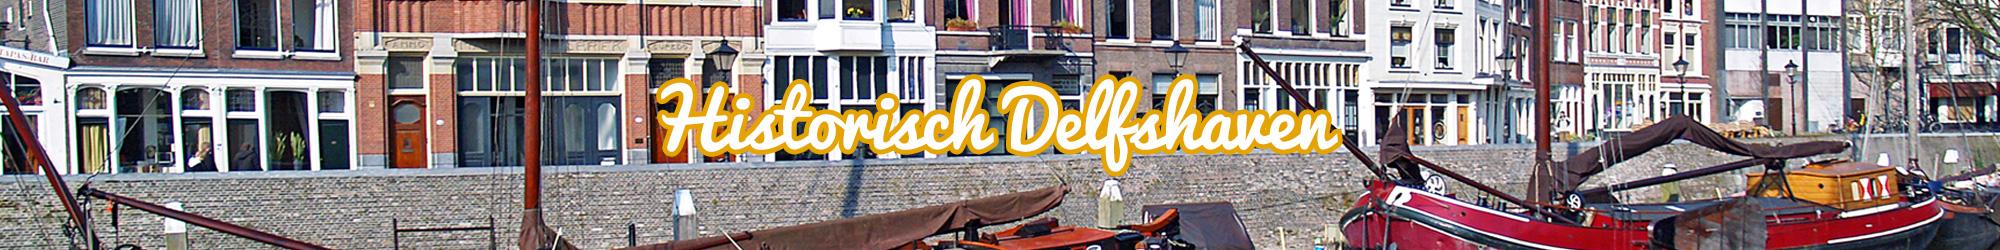 Historisch Delfshaven - Winkelen in Delfshaven